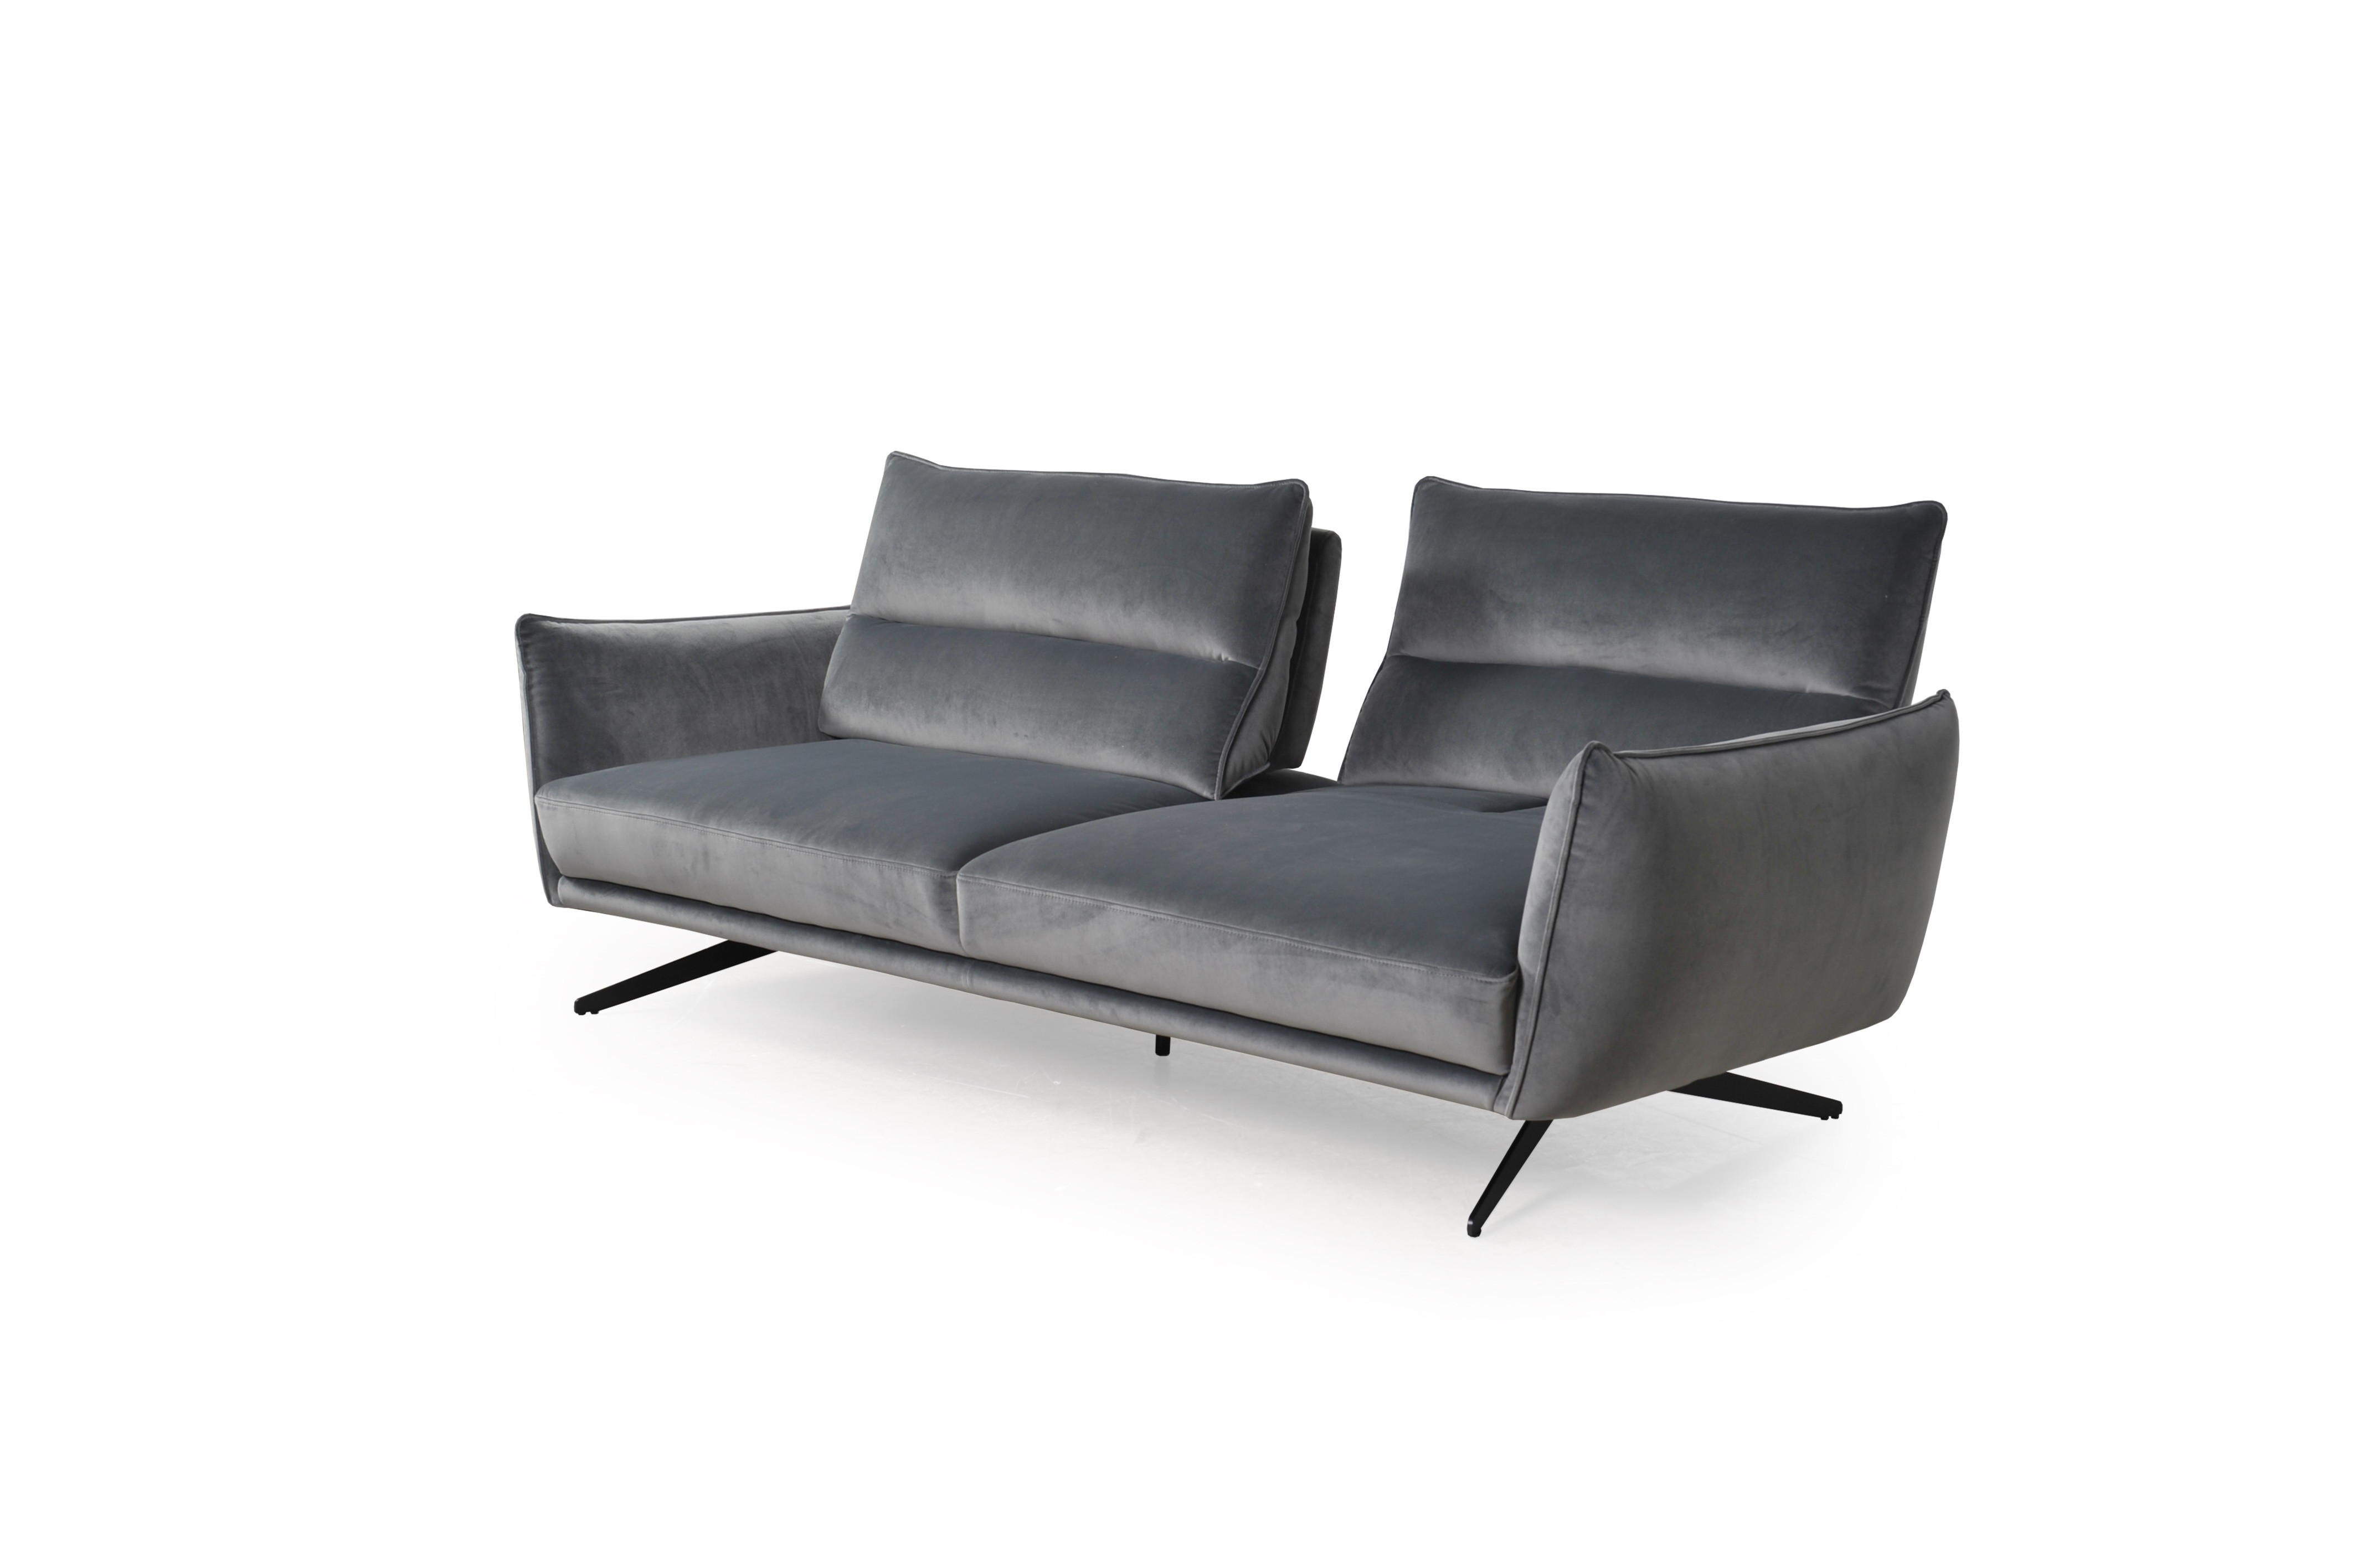 296 - Royce Swan Gray Sofa